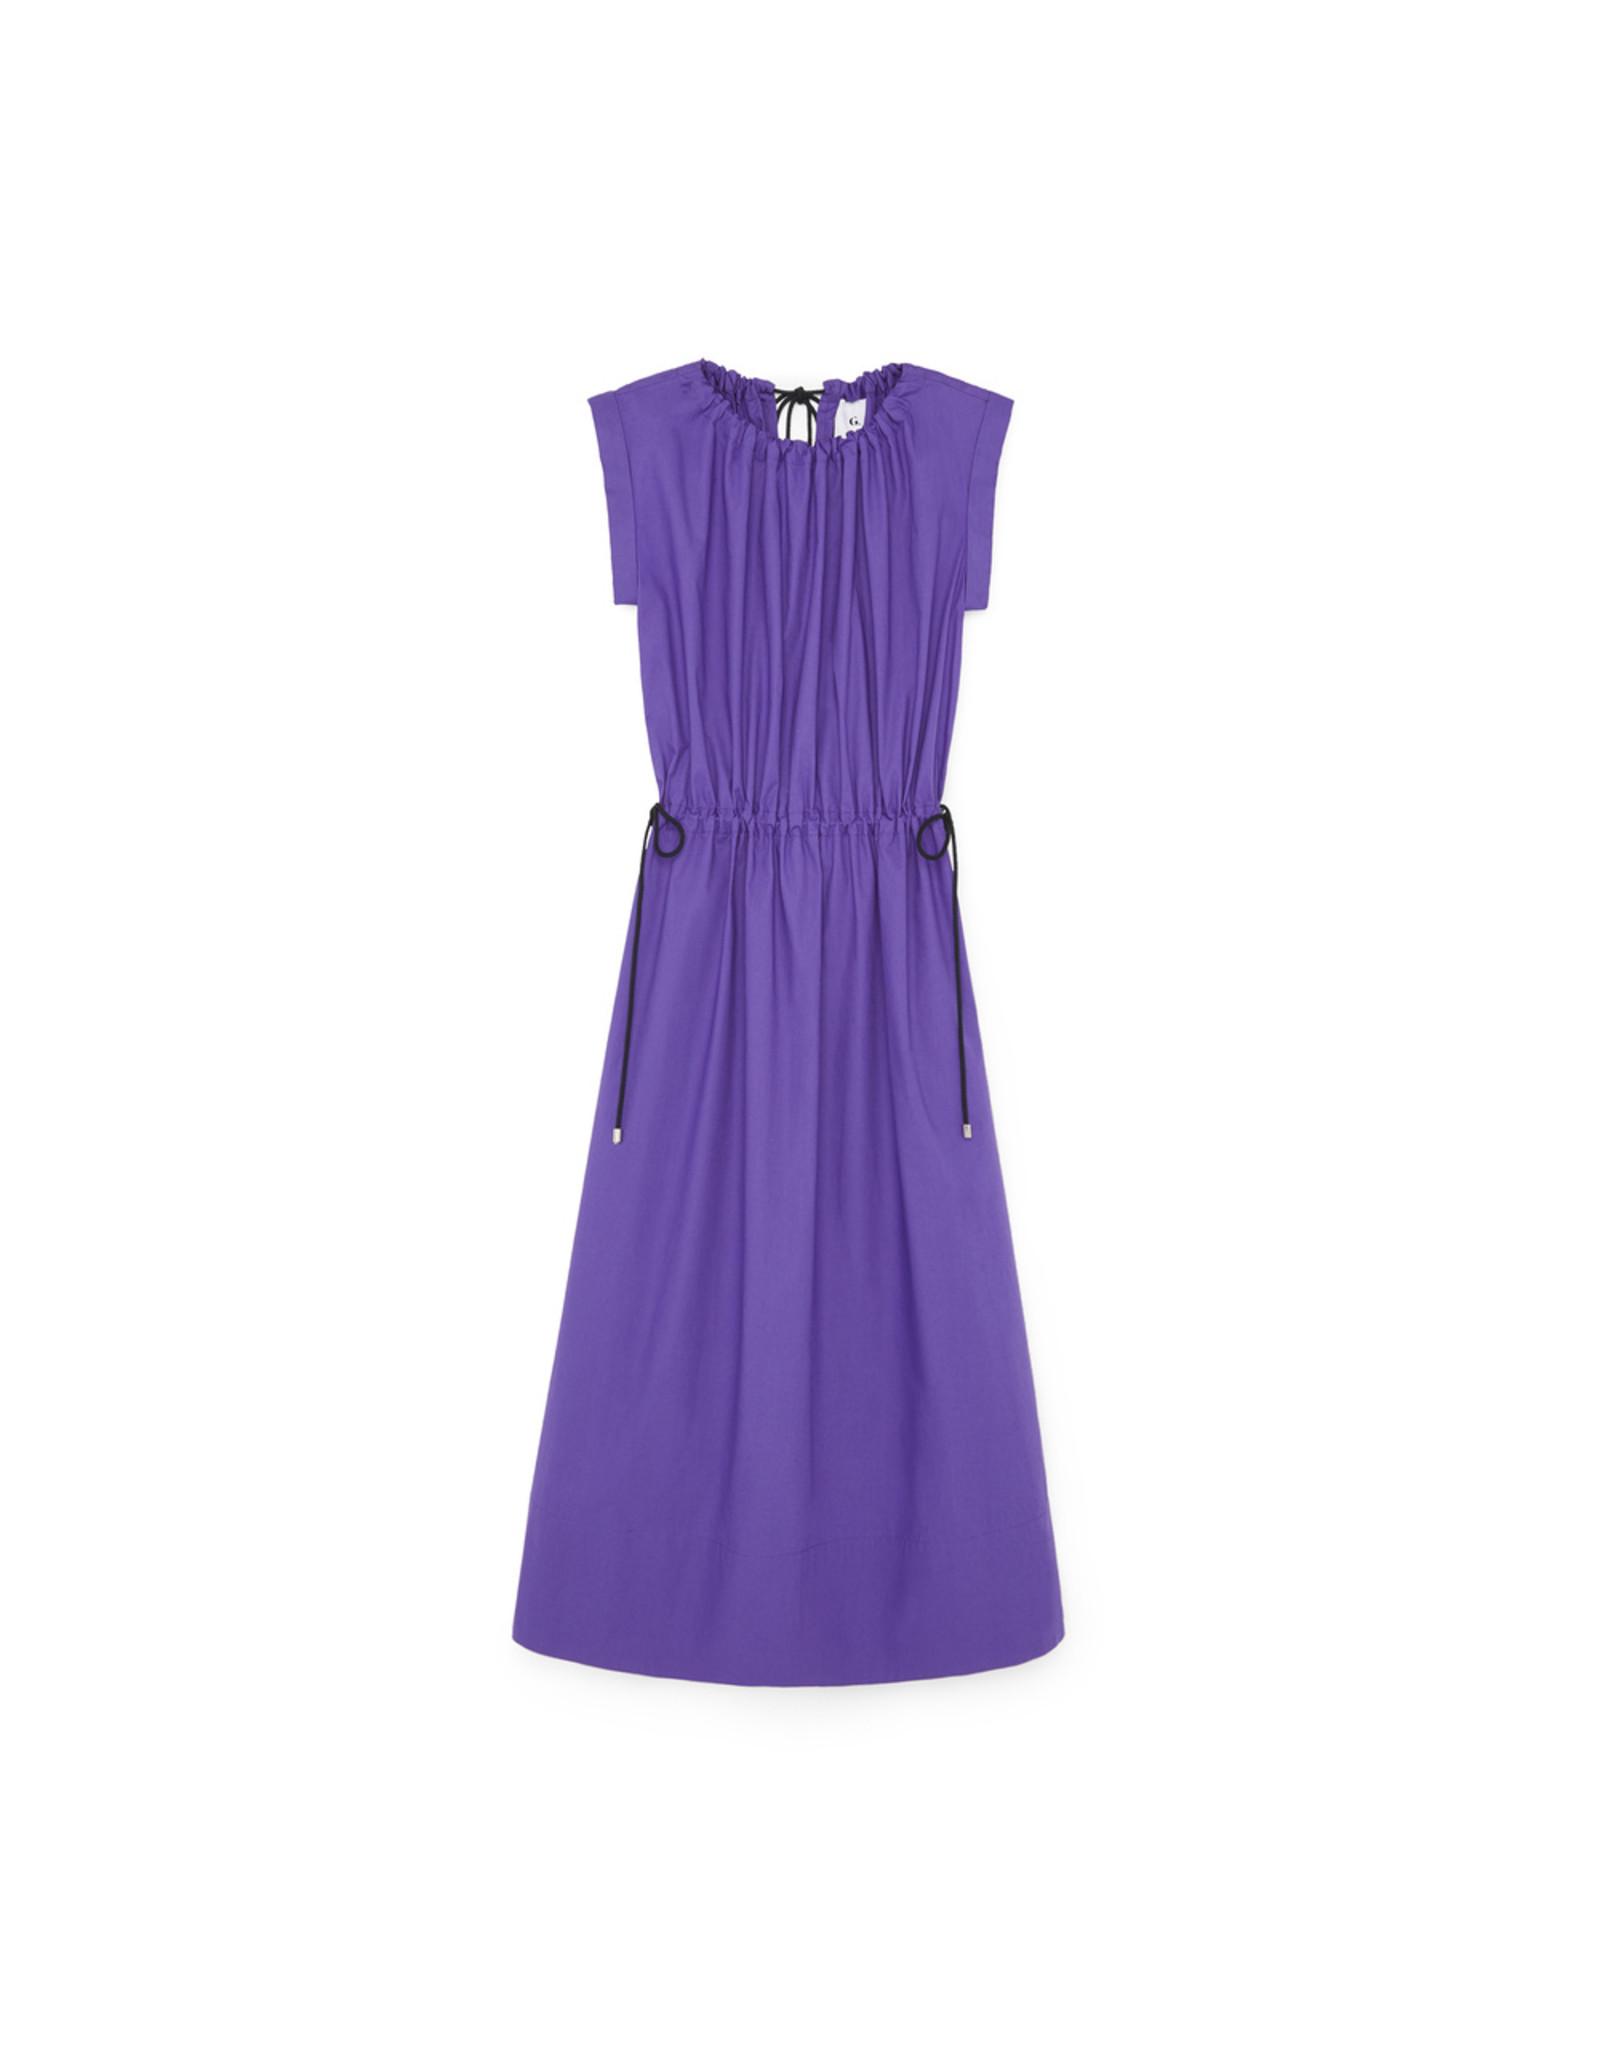 G. Label G. Label Kaci Drawstring Shirtdress (Size: 12, Color: Purple)